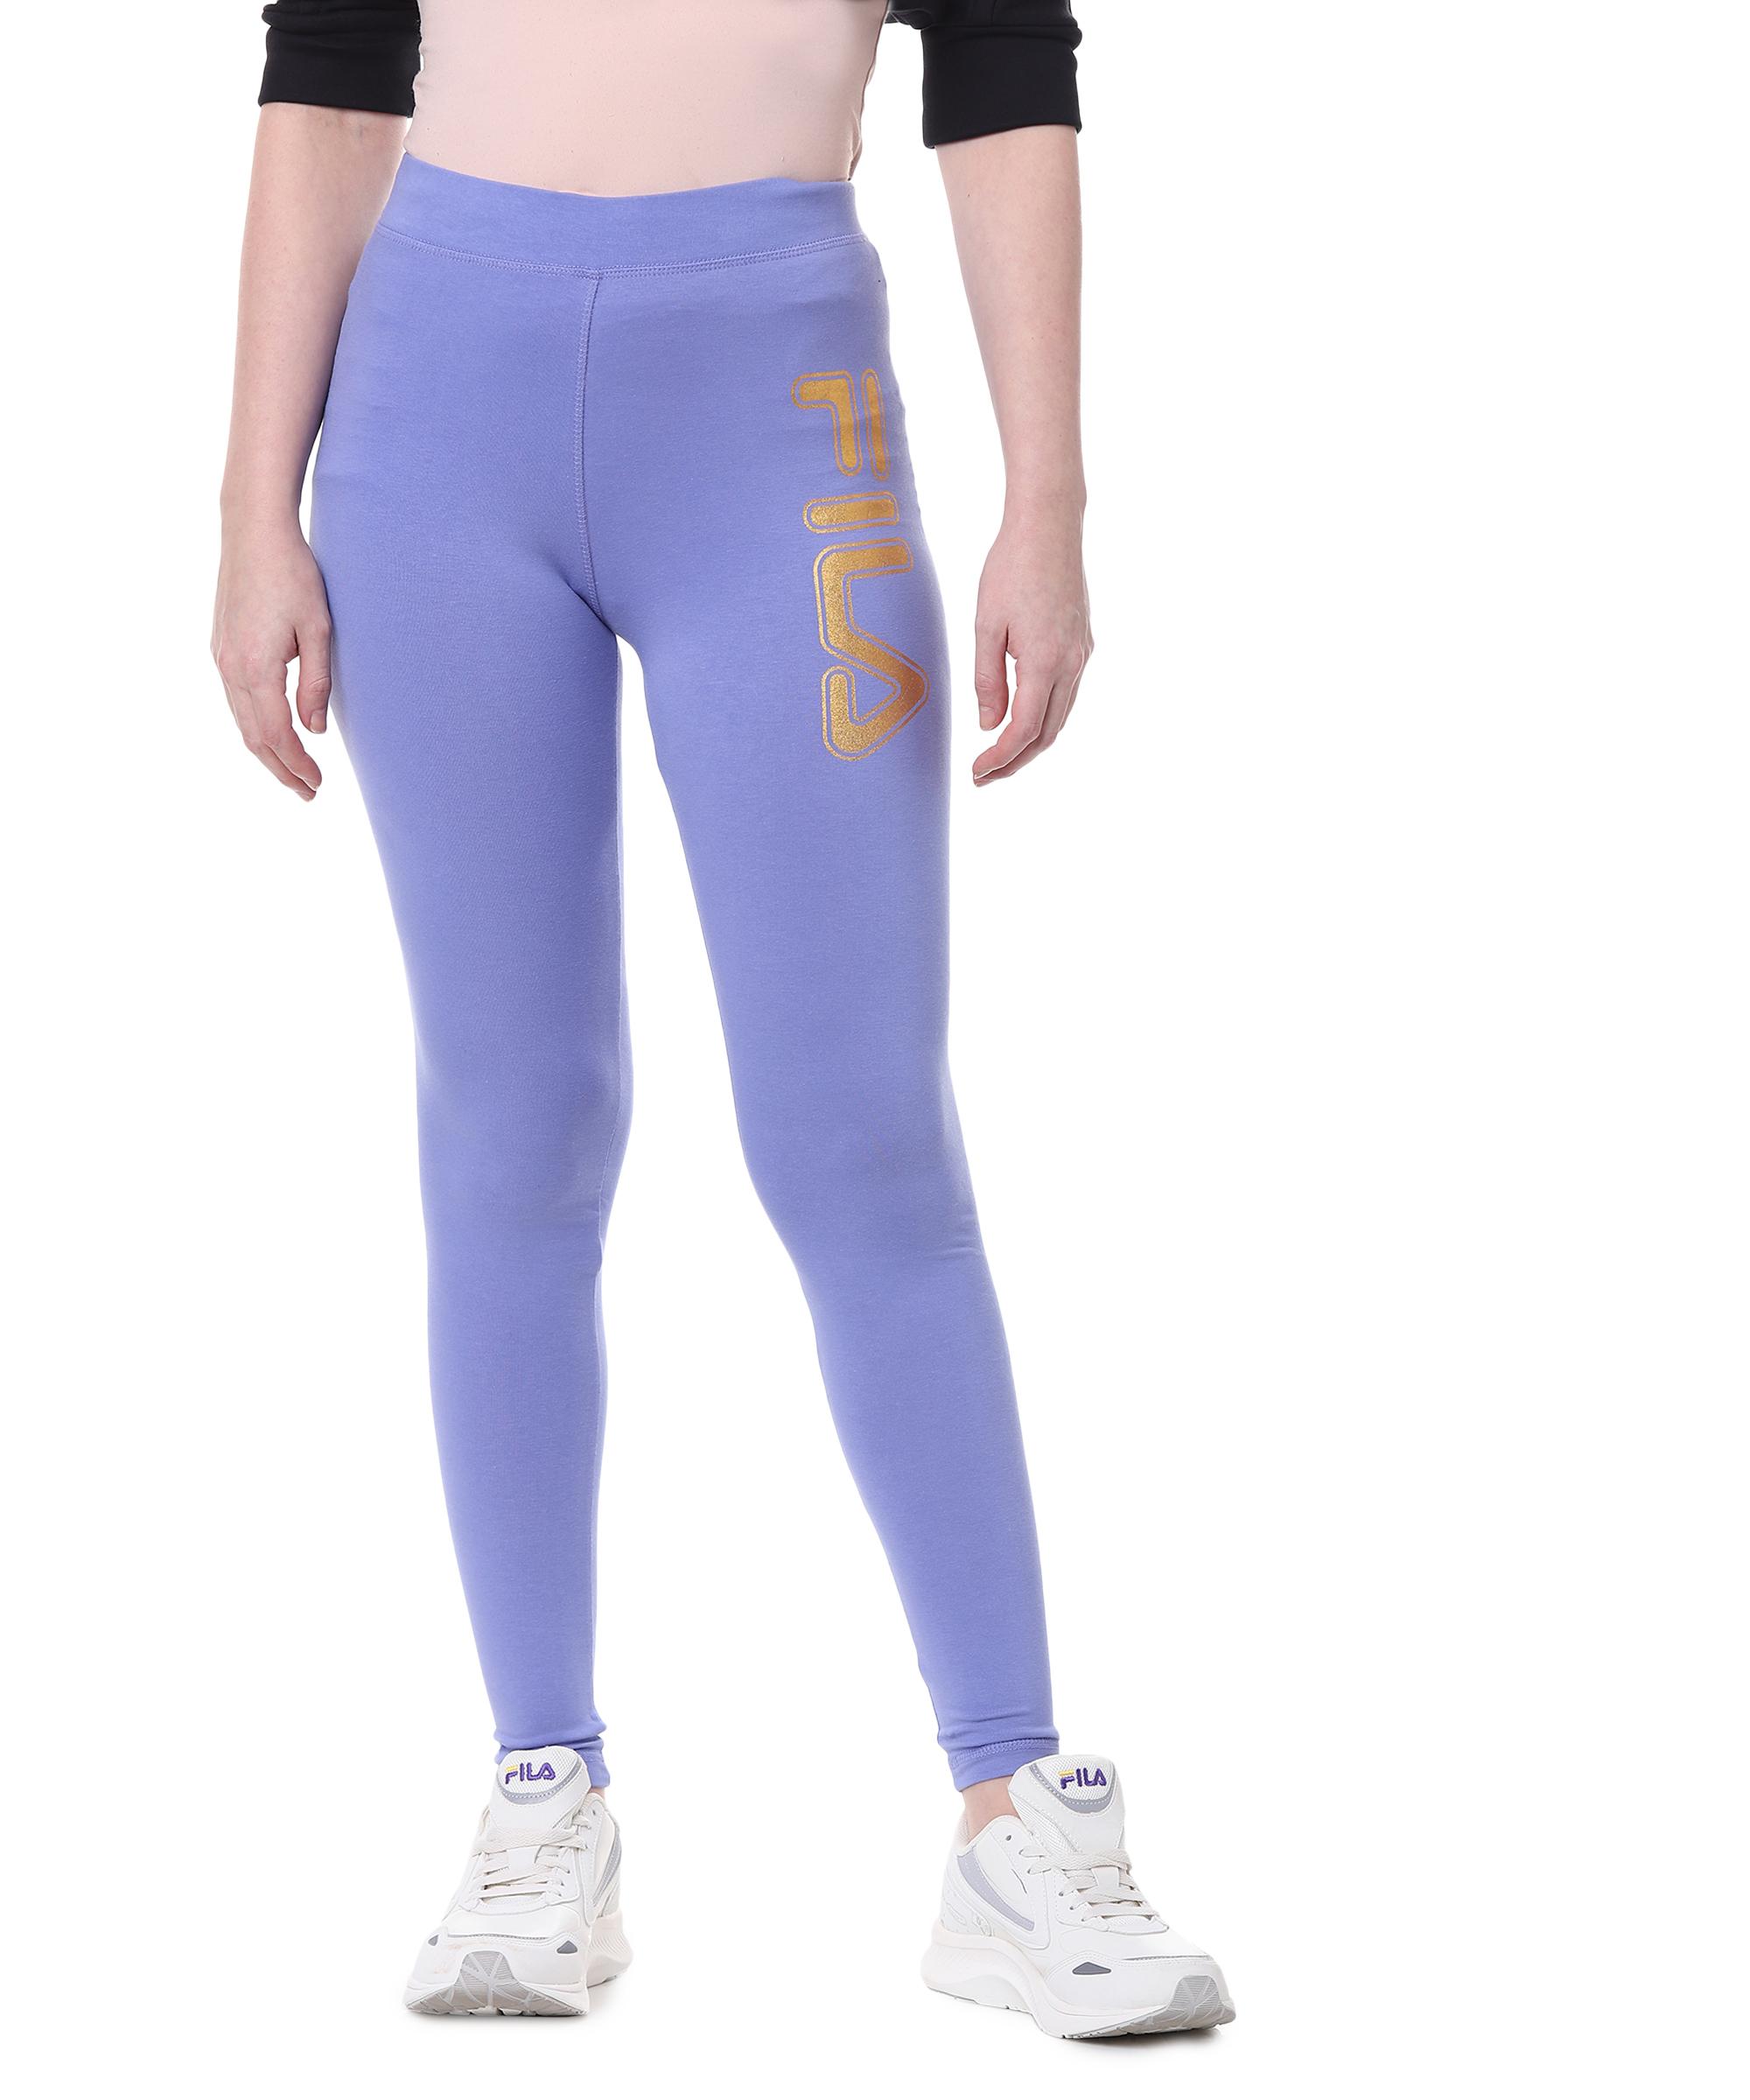 FILA | Purple Activewear Leggings